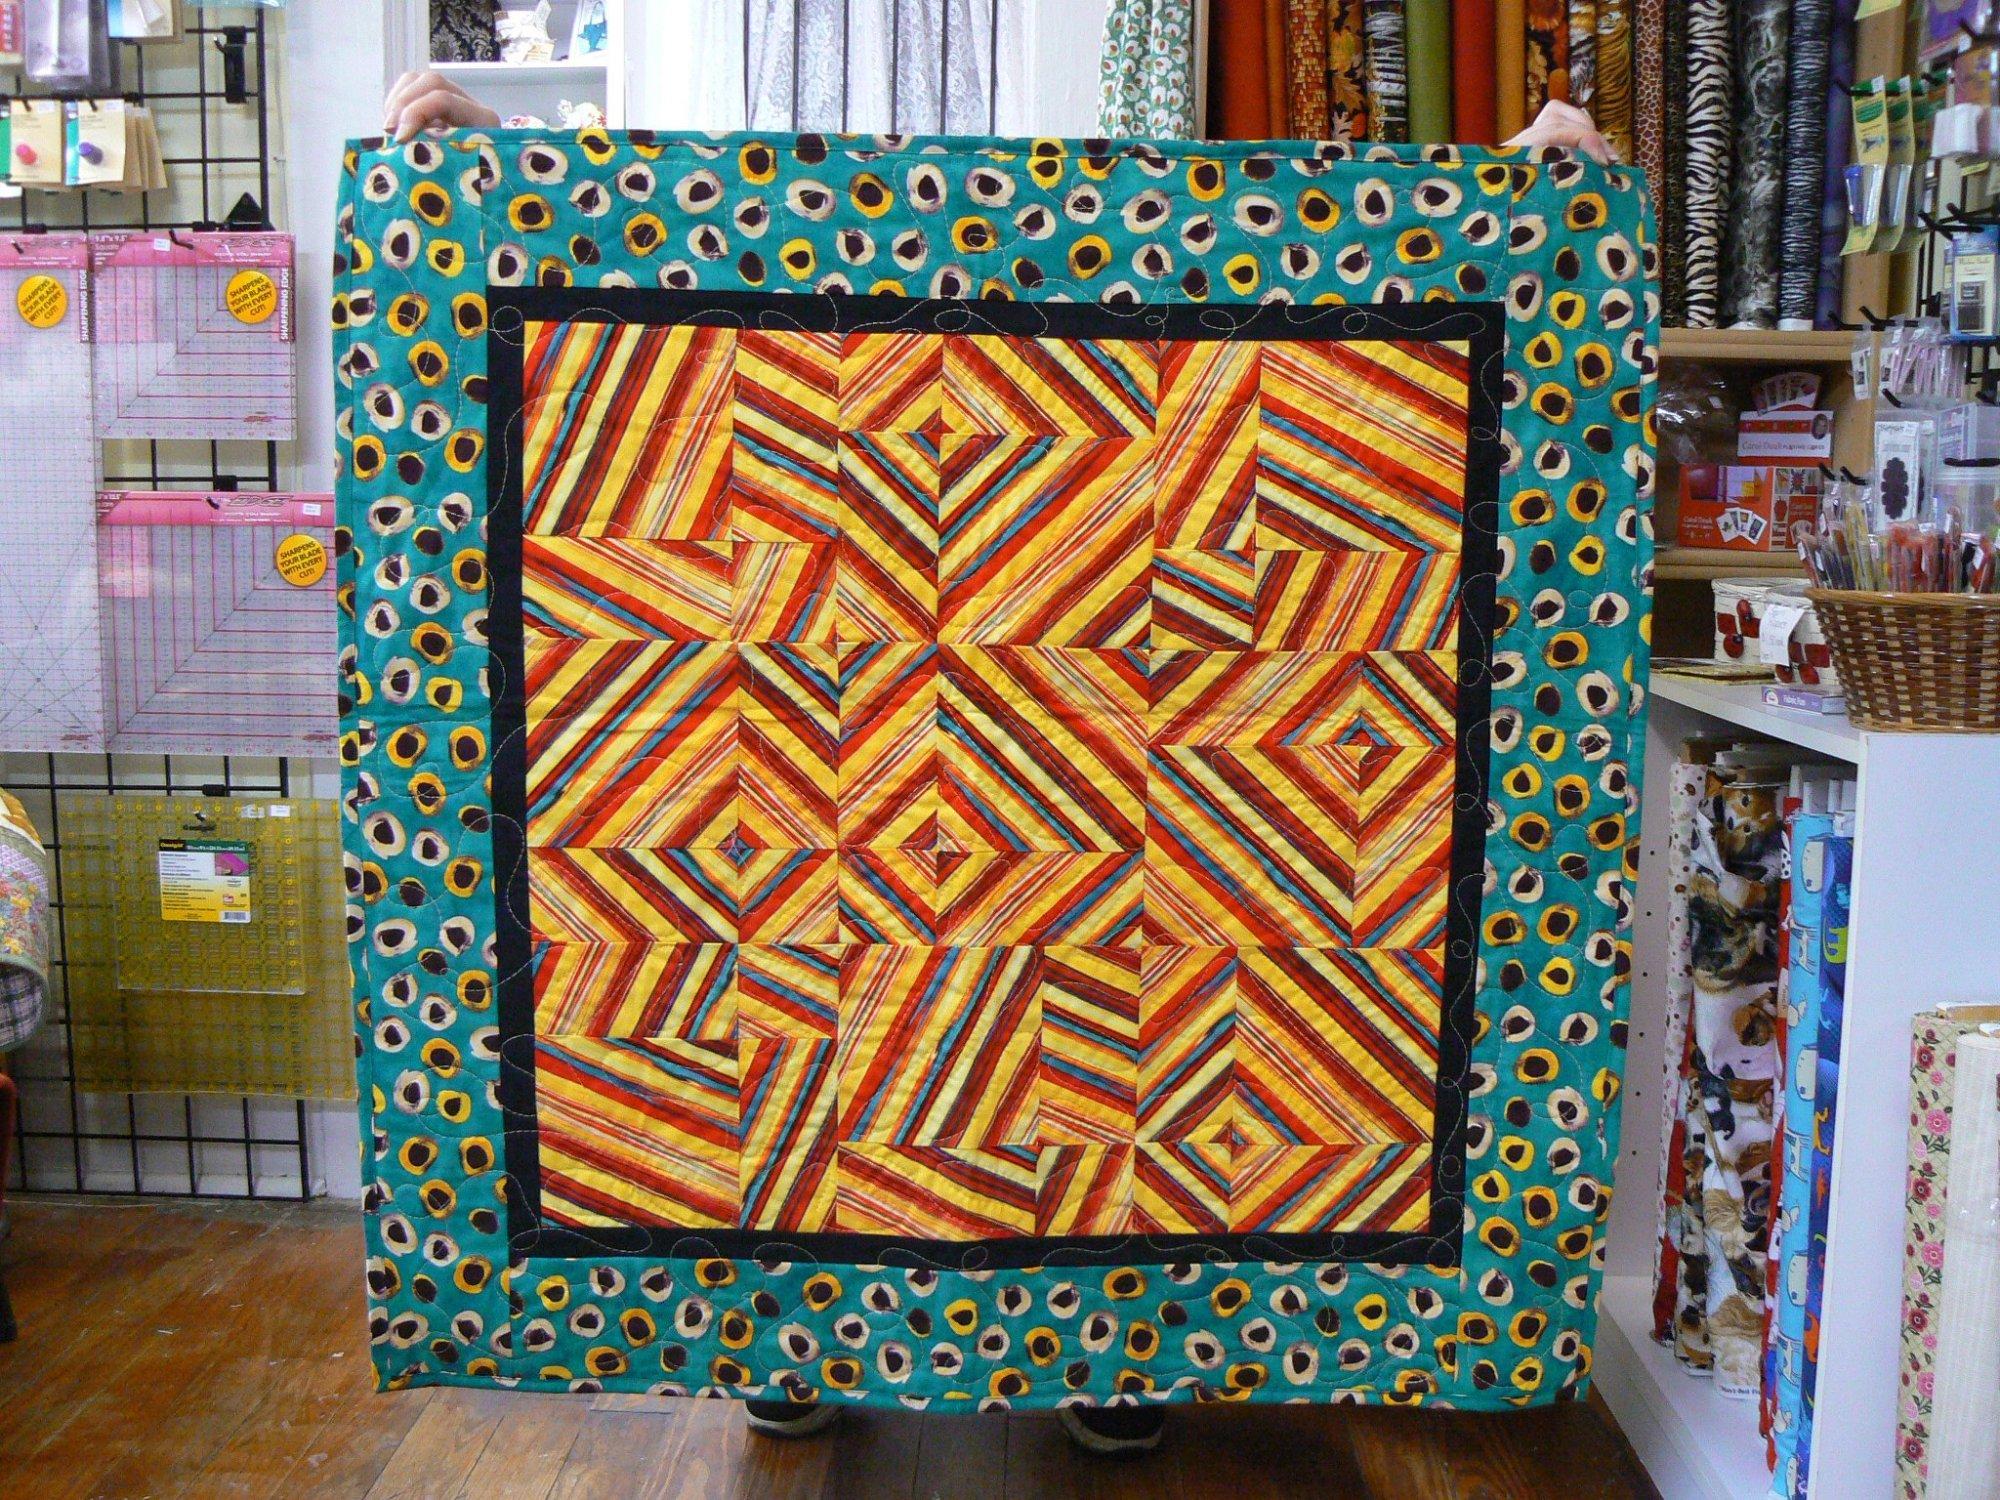 Frenzy Quilt 35x35